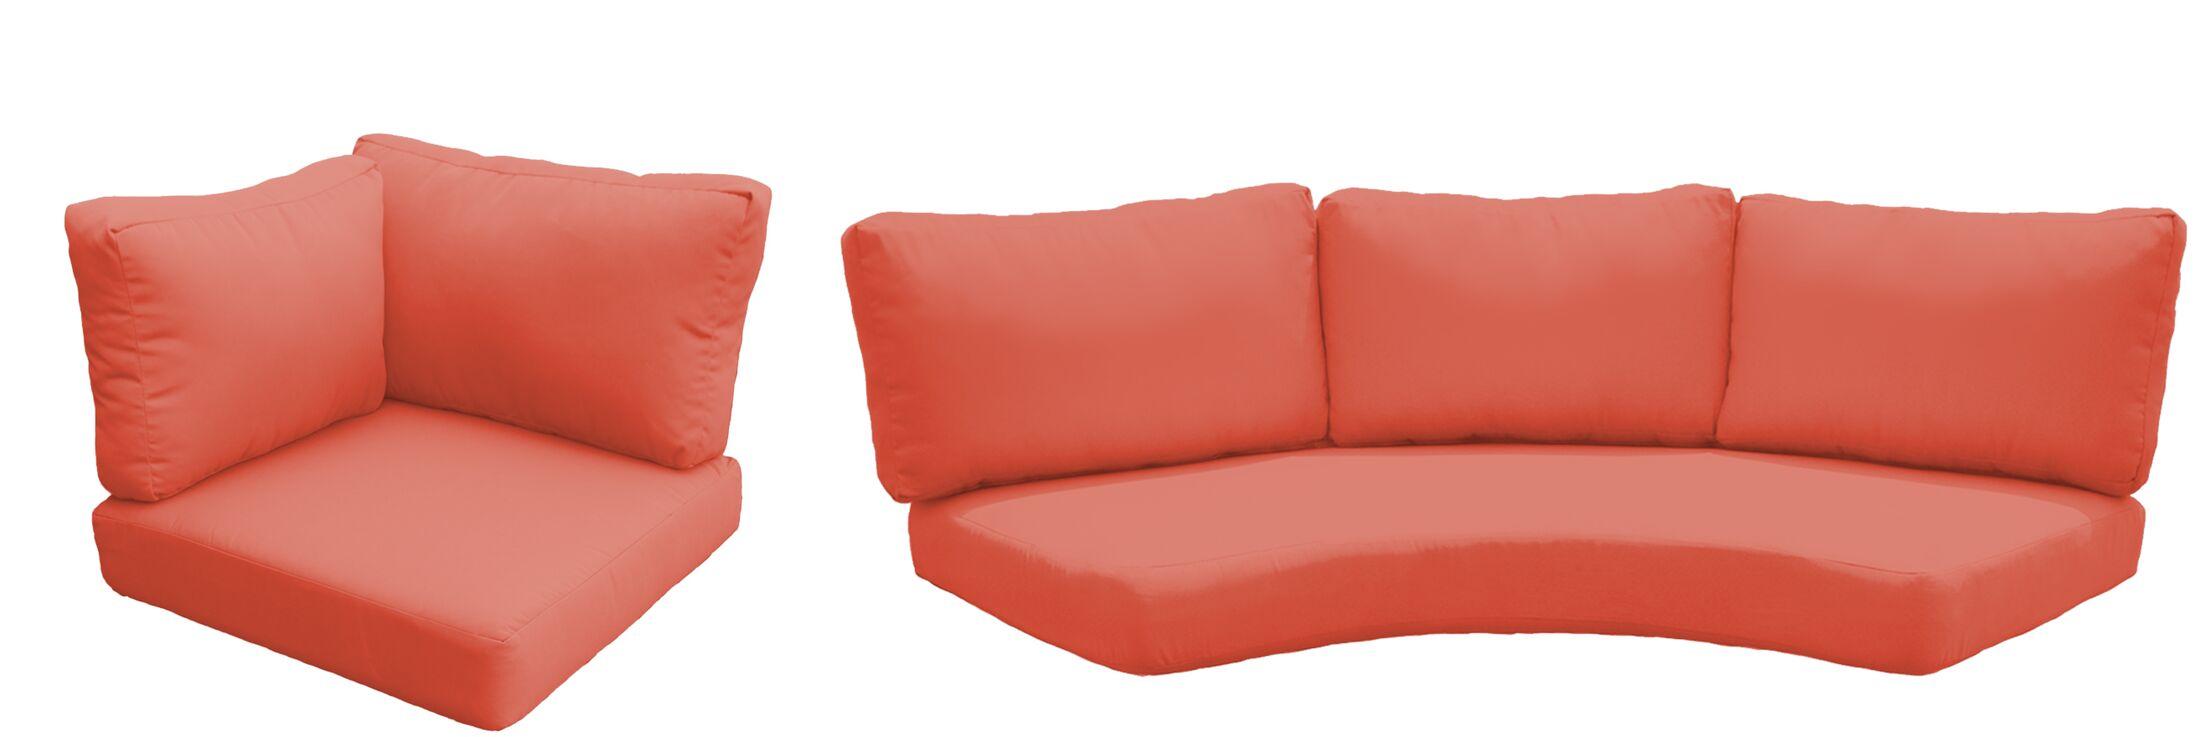 East Village 10 Piece Outdoor Cushion Set Fabric: Tangerine